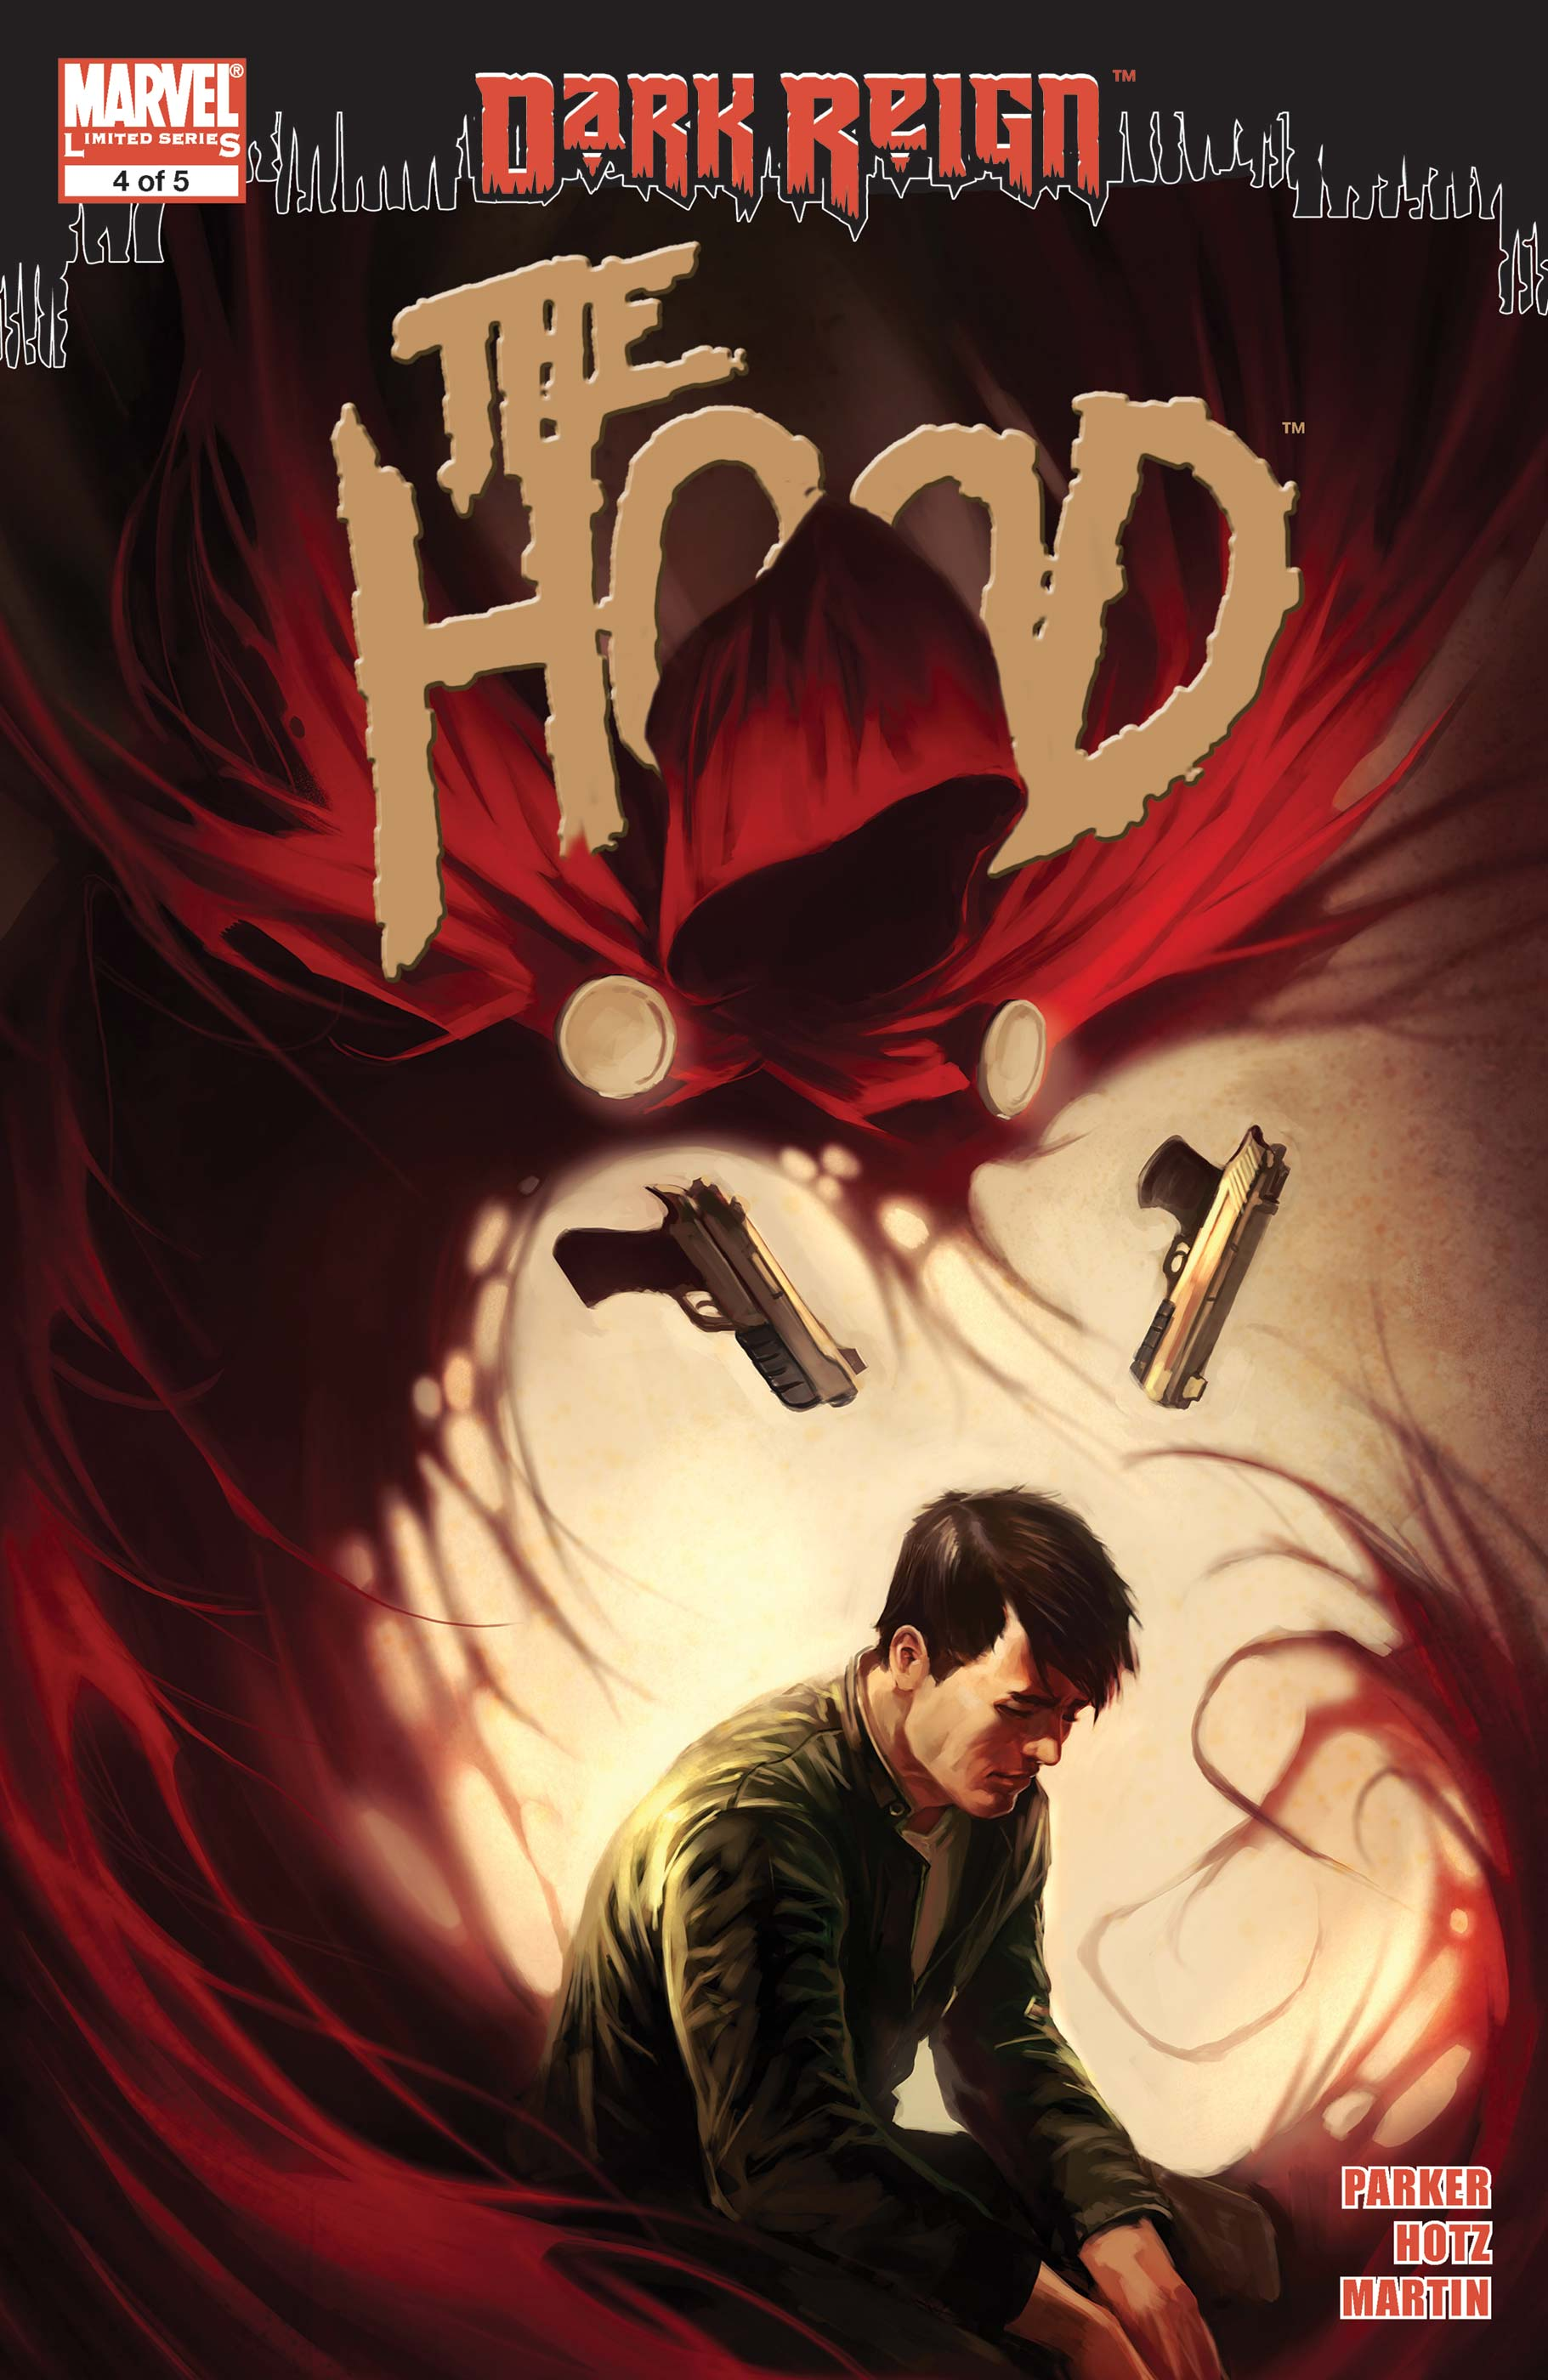 Dark Reign: The Hood (2009) #4